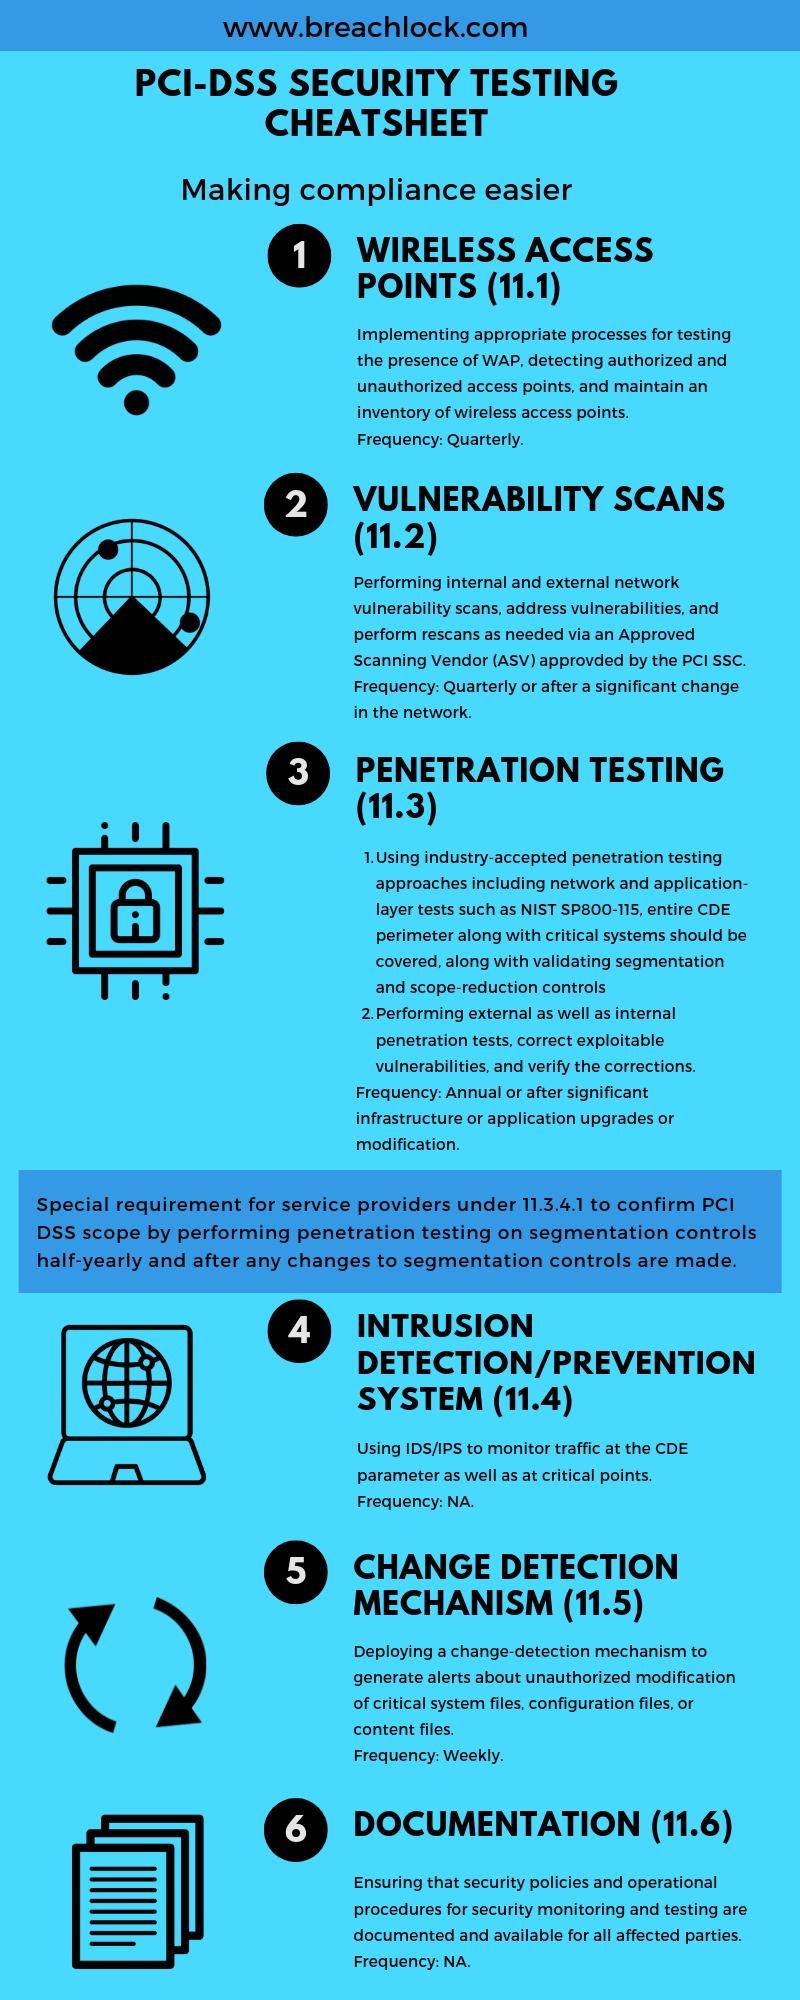 Pci Dss Security Testing Cheatsheet Infographic - Breachlock-4986